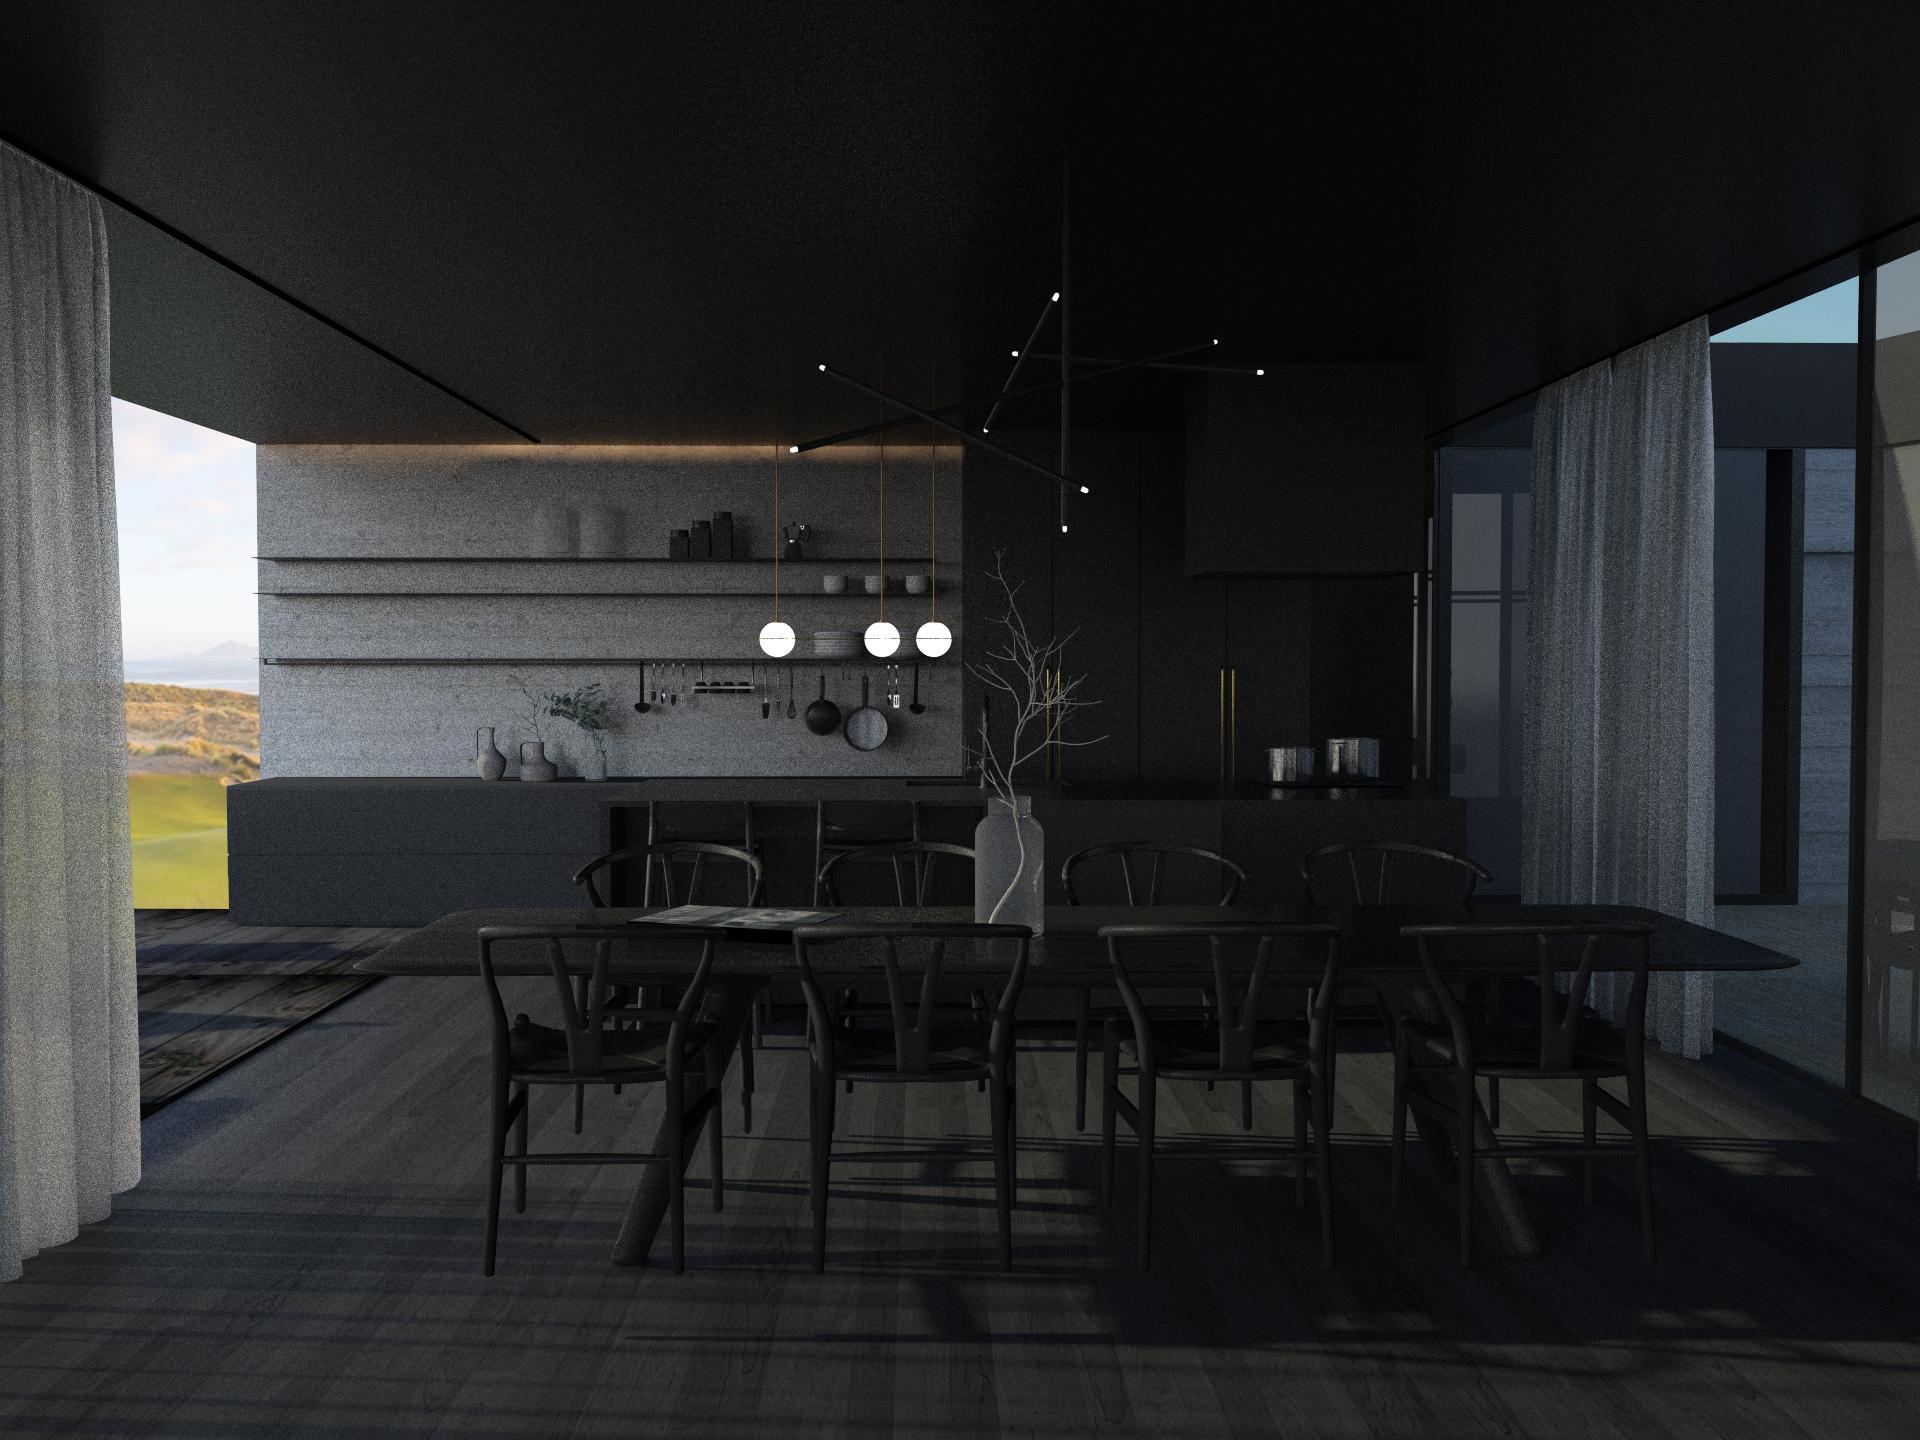 Atelier Aitken Breamtail kitchen dining black.jpg